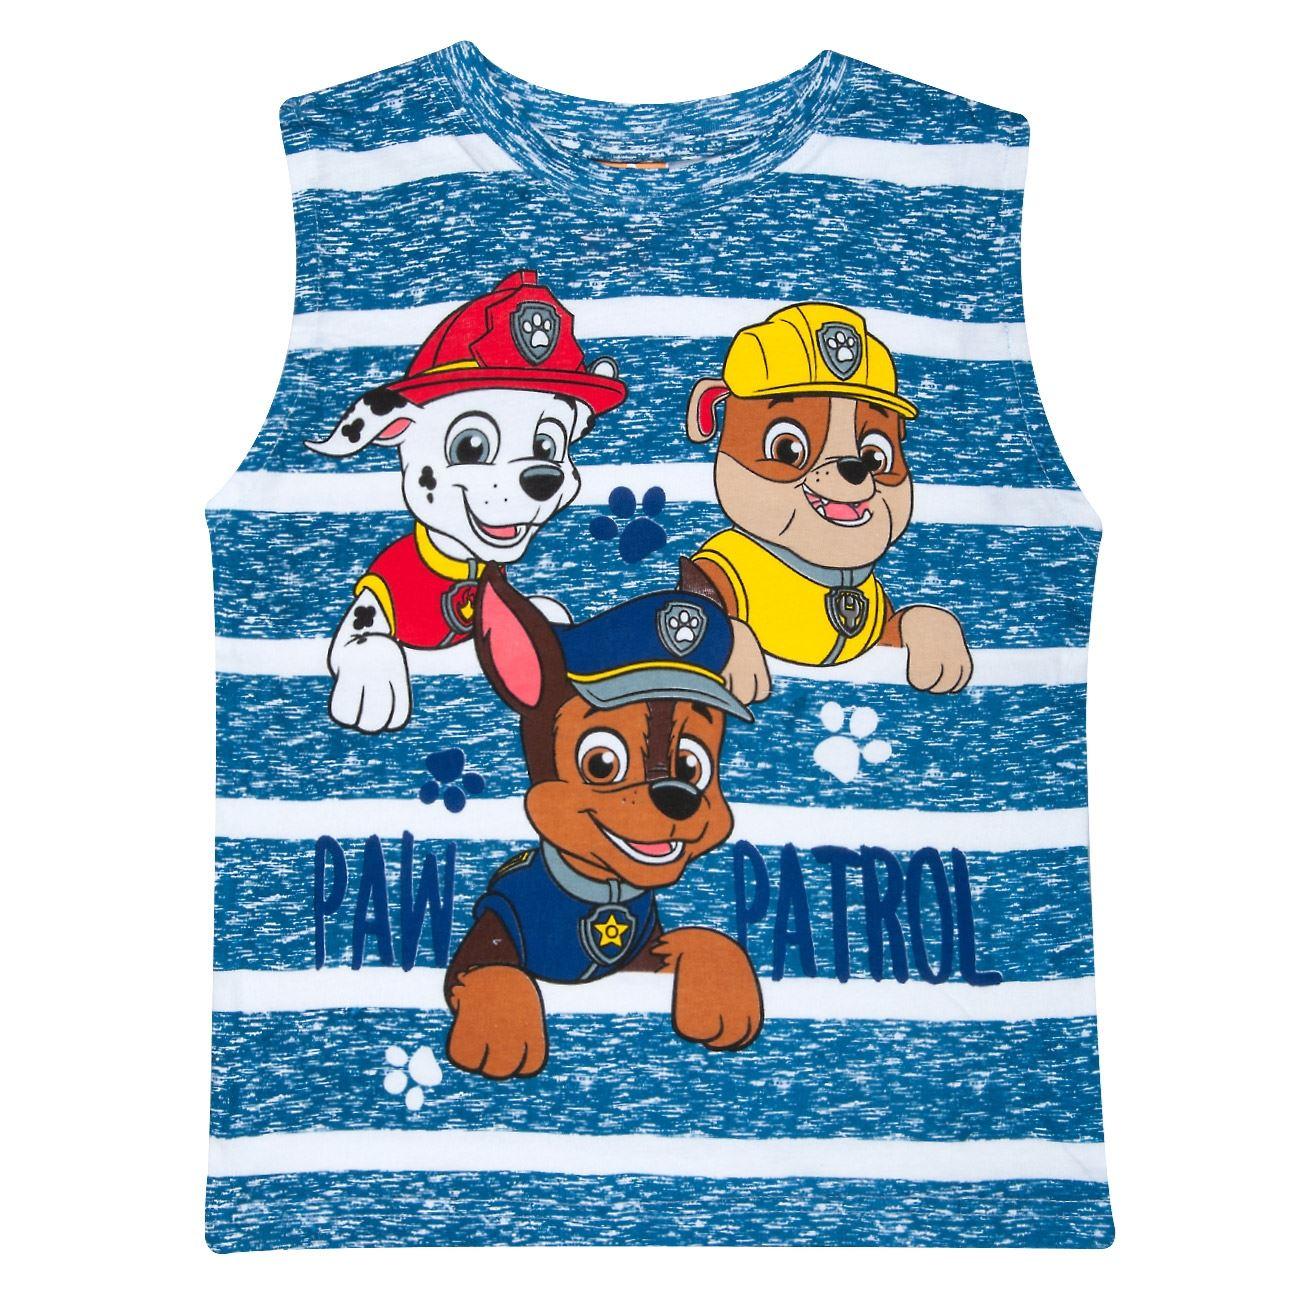 7790186caee Μπλουζάκι Αμάνικο Παιδικό Μπλε Ριγέ PAW PATROL